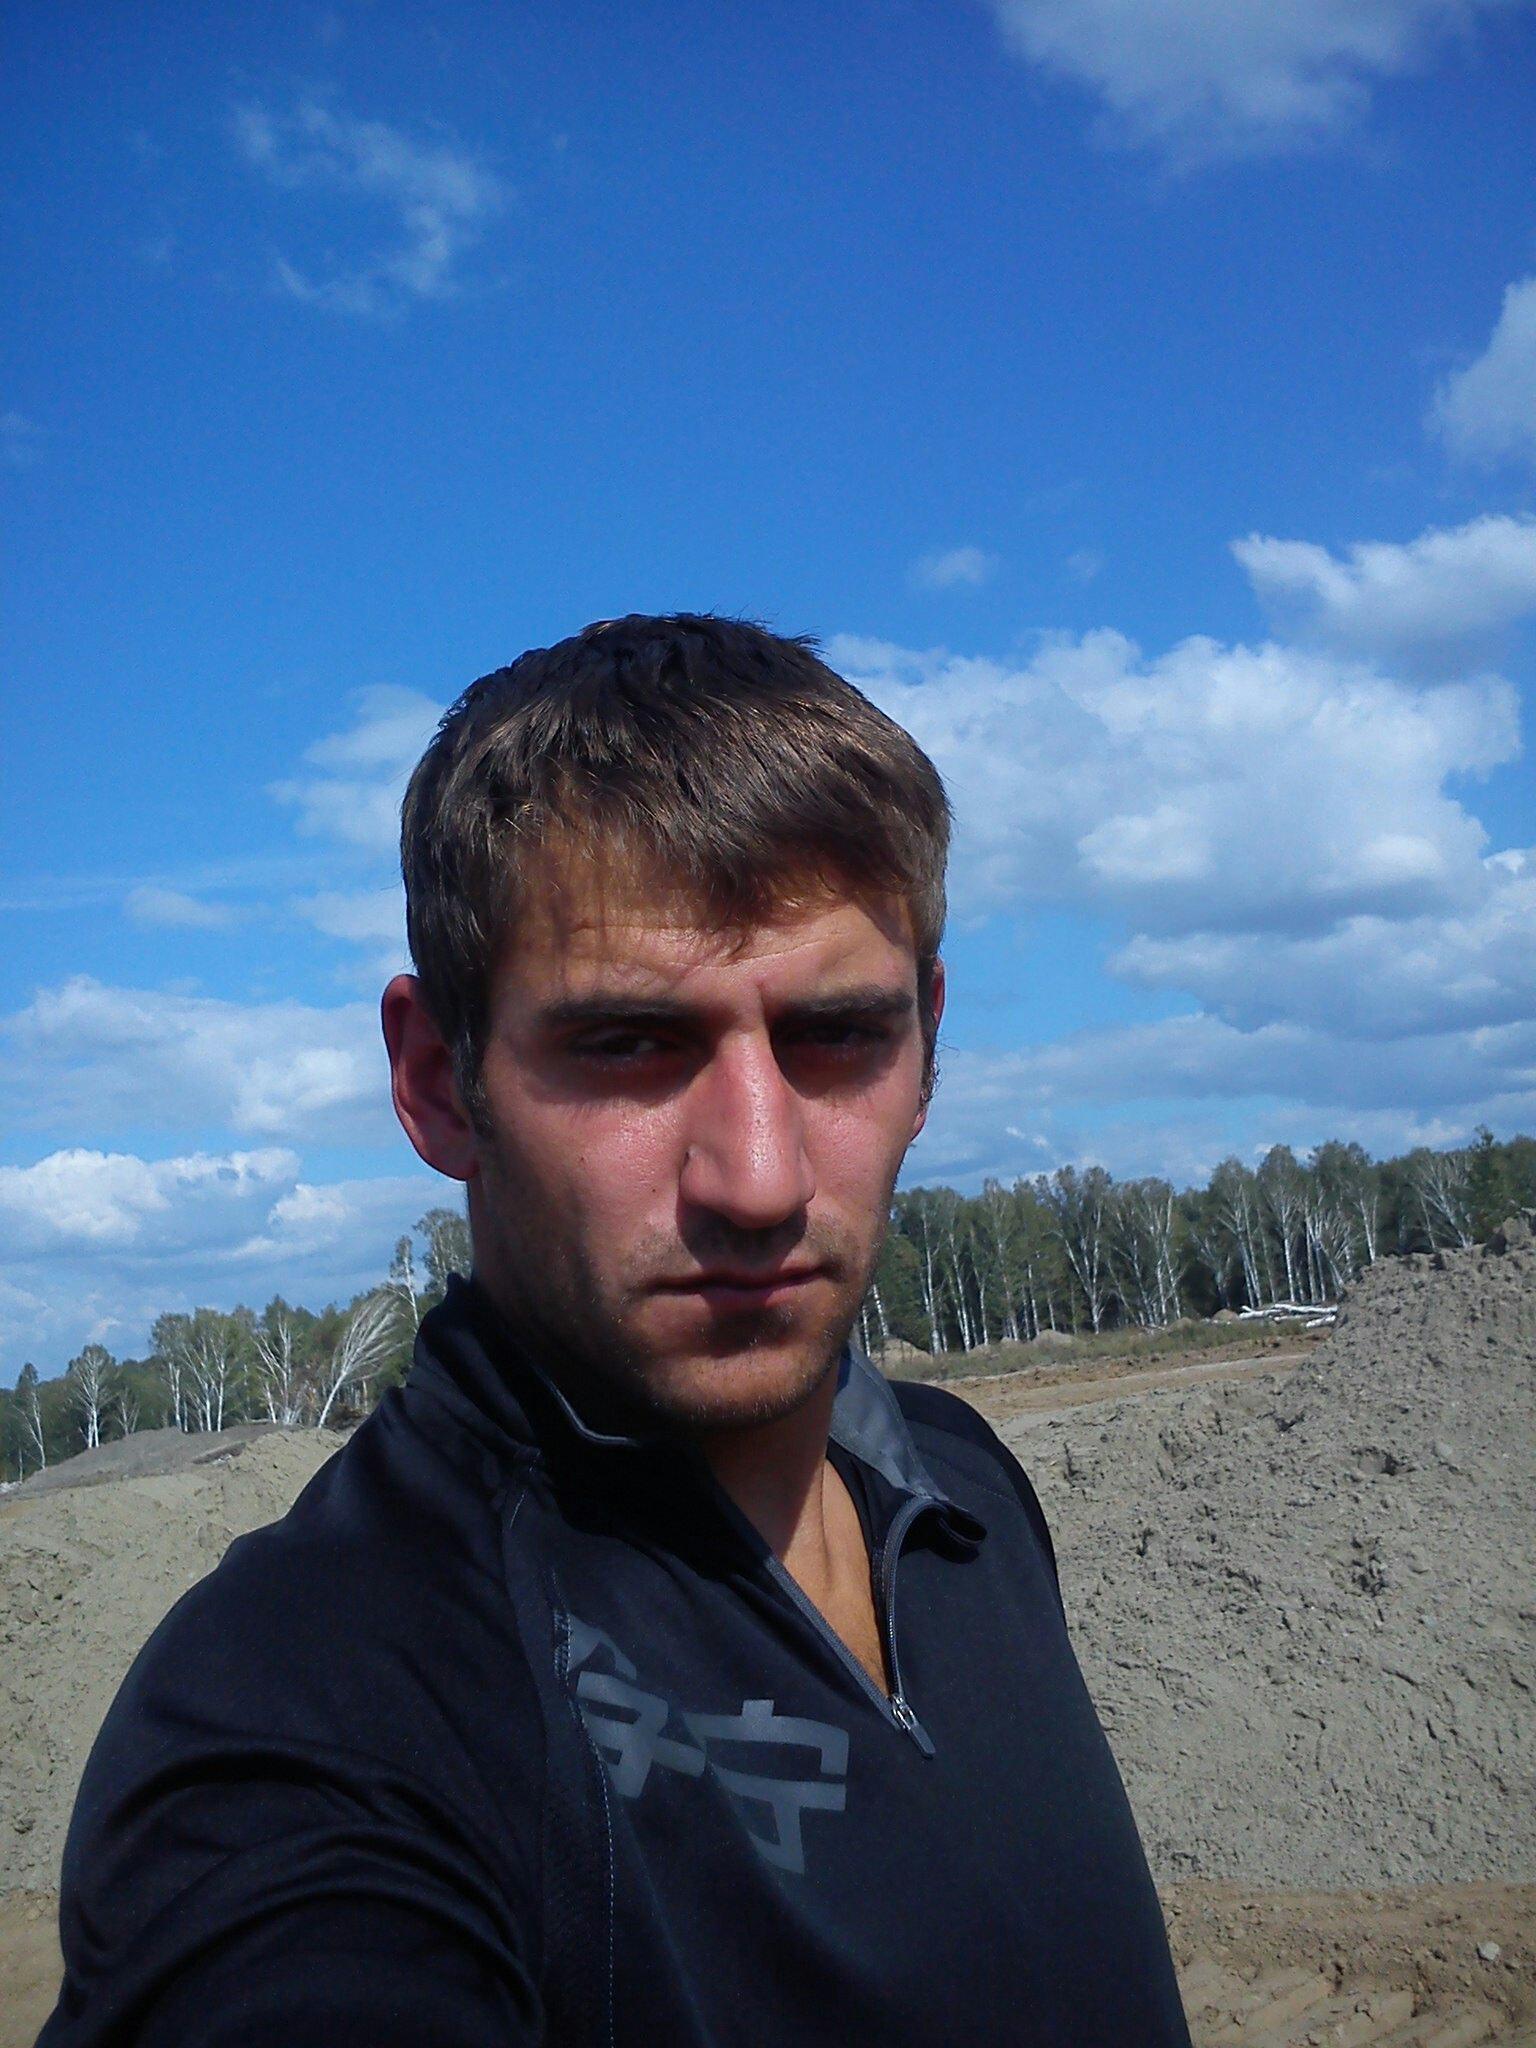 Андрей, 41, Горячий Ключ, Краснодарский, Россия